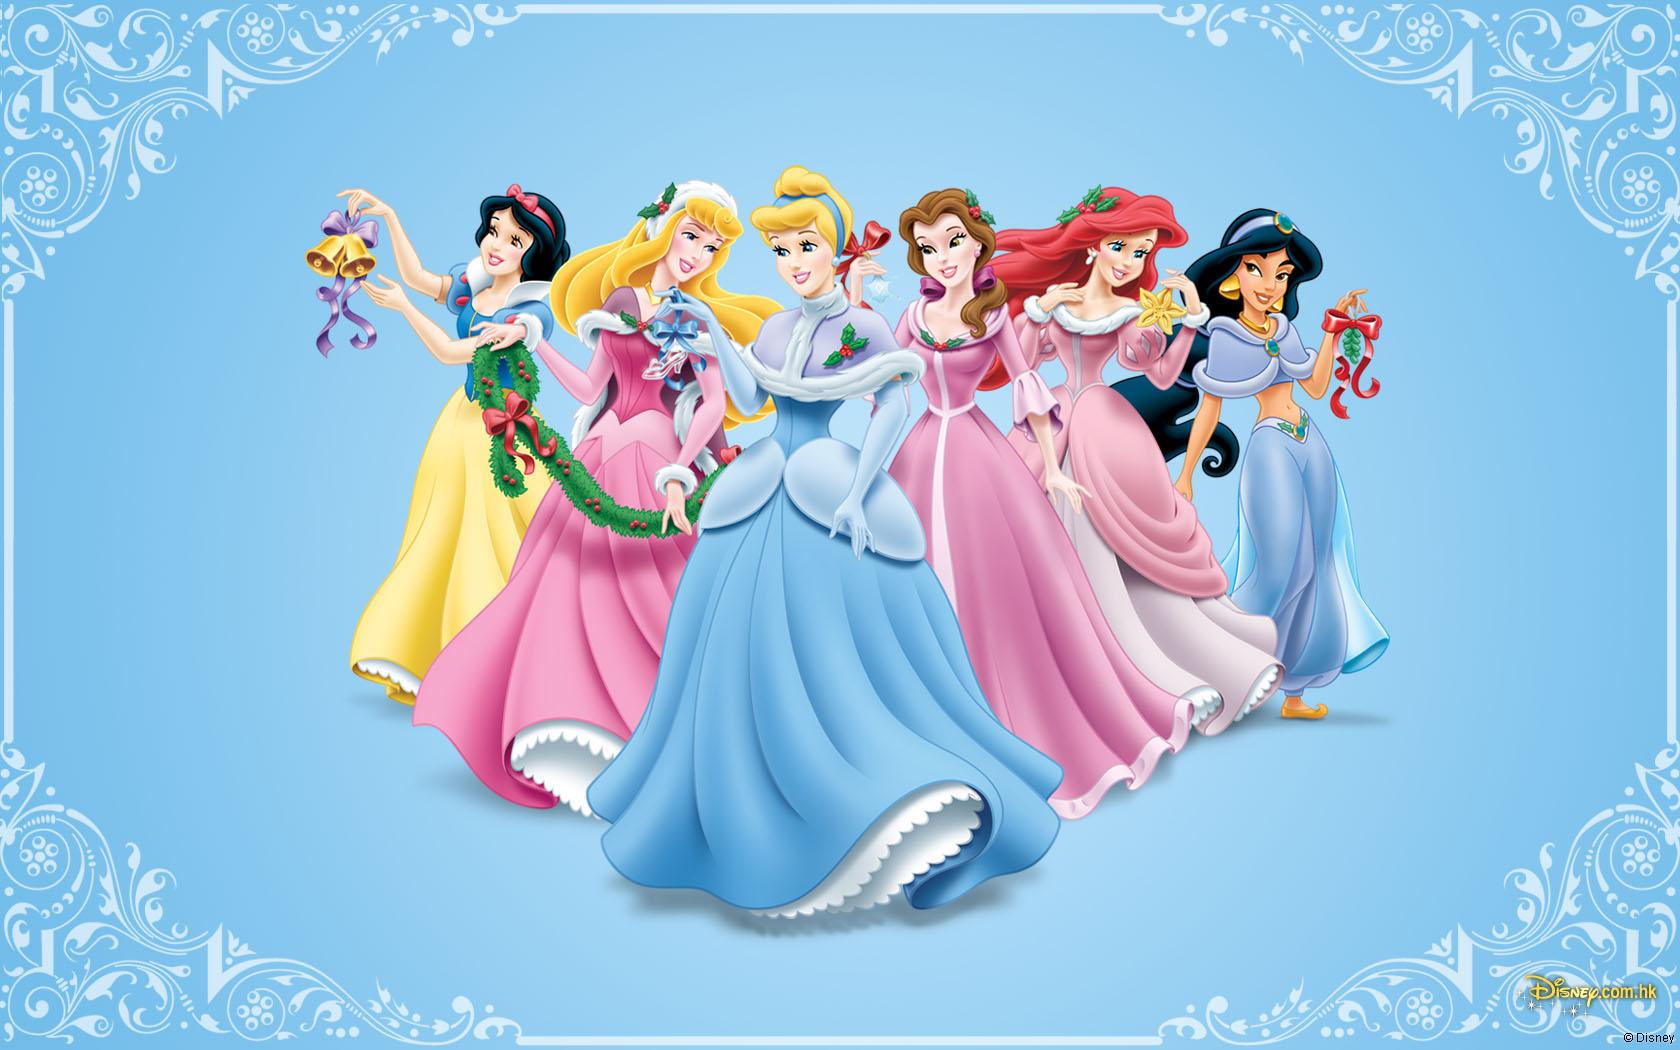 Disney Princess Christmas   Disney Christmas Wallpaper 27835231 1680x1050